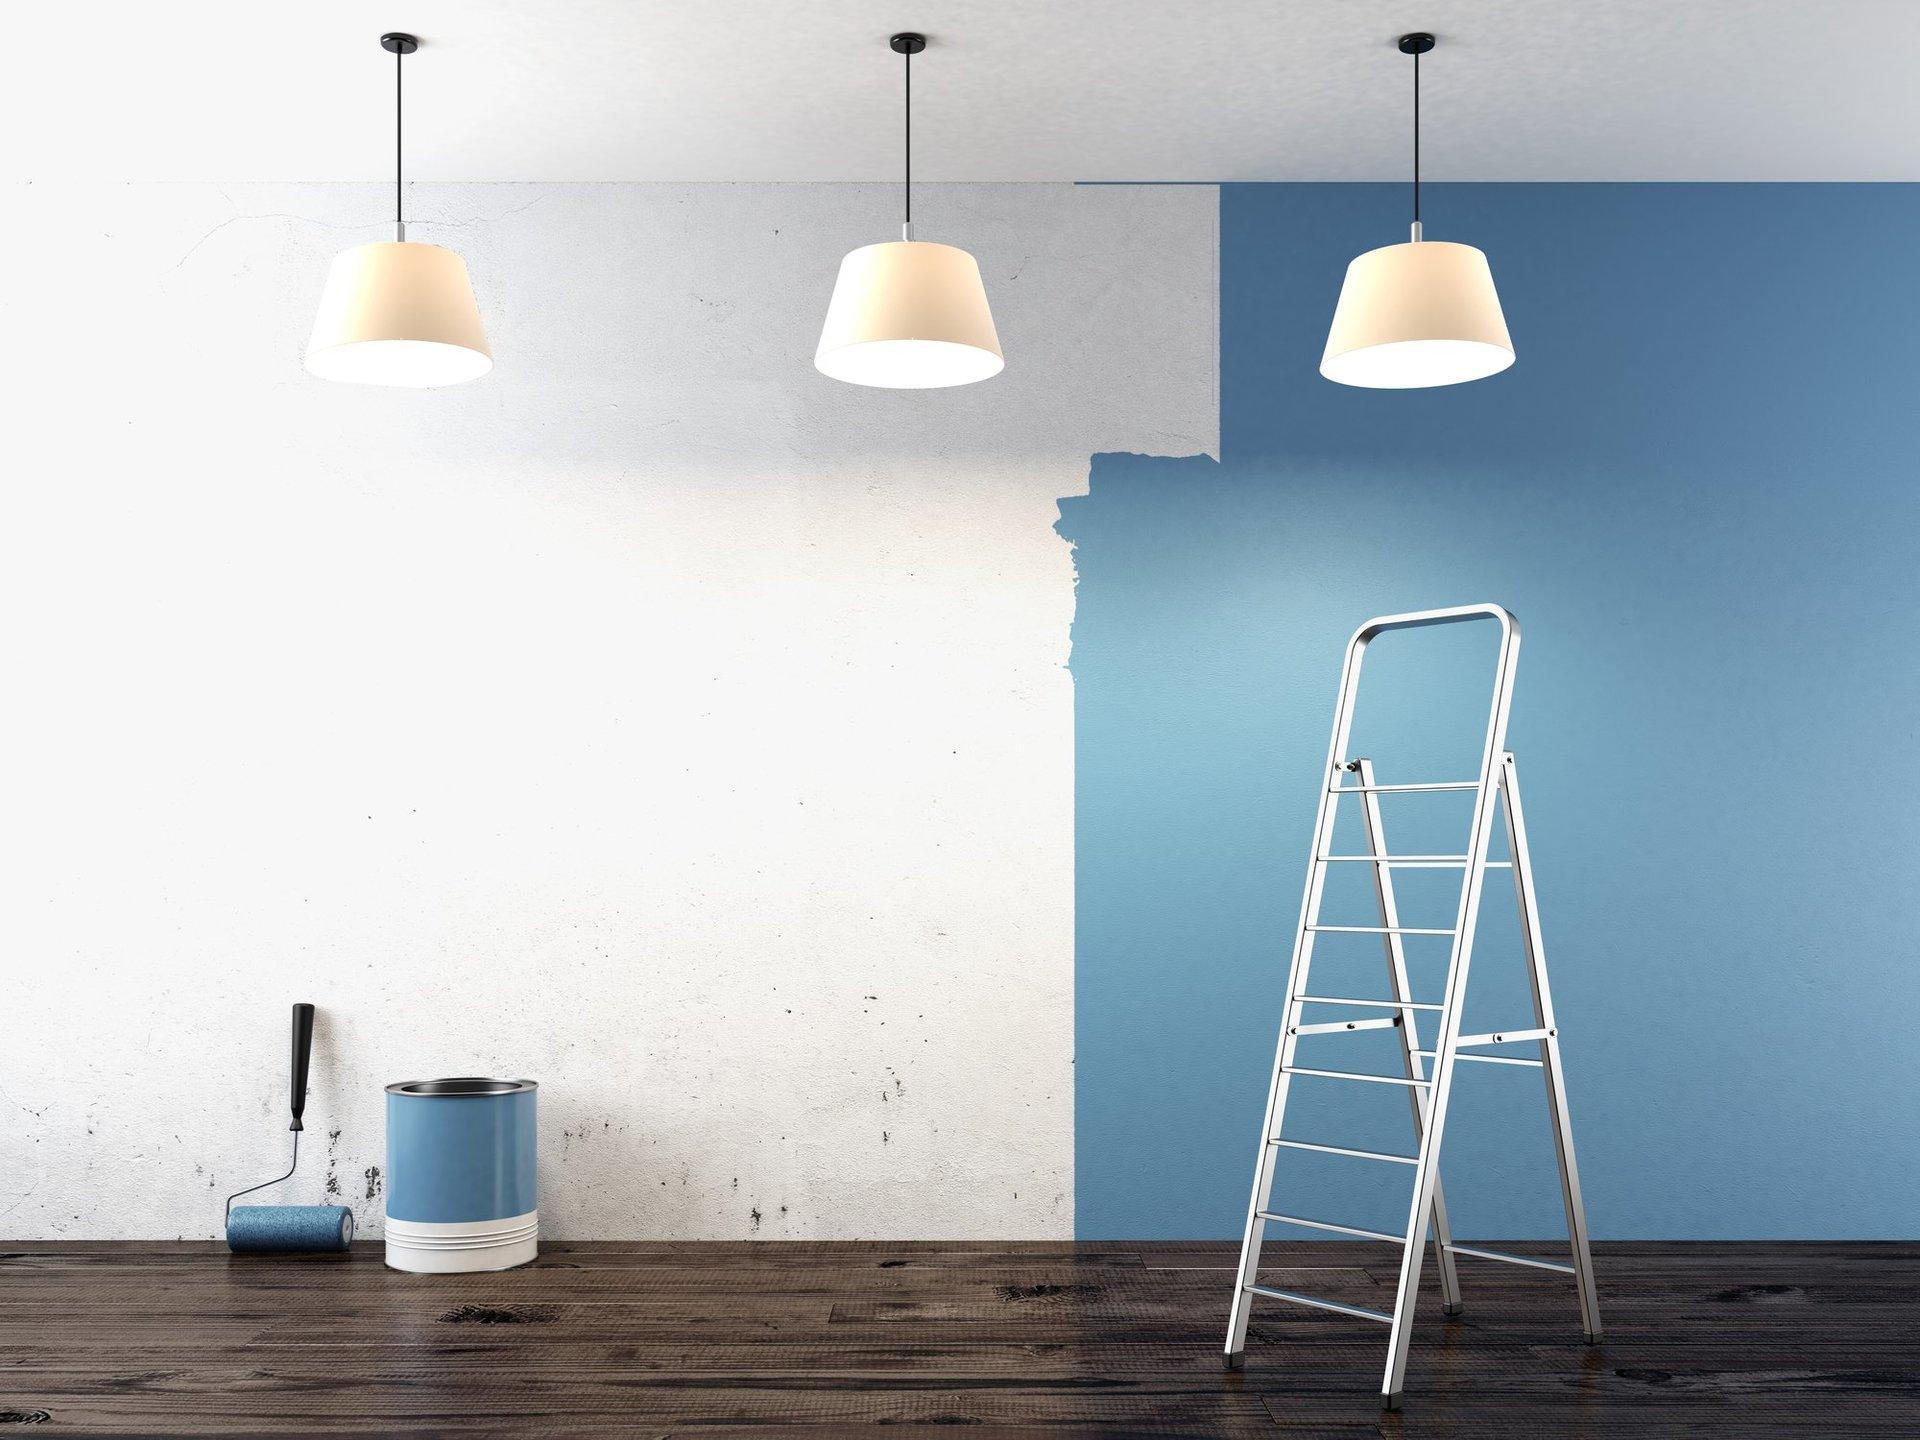 Cabinet Refinishing in Phoenix, AZ - Professional Painting Inc